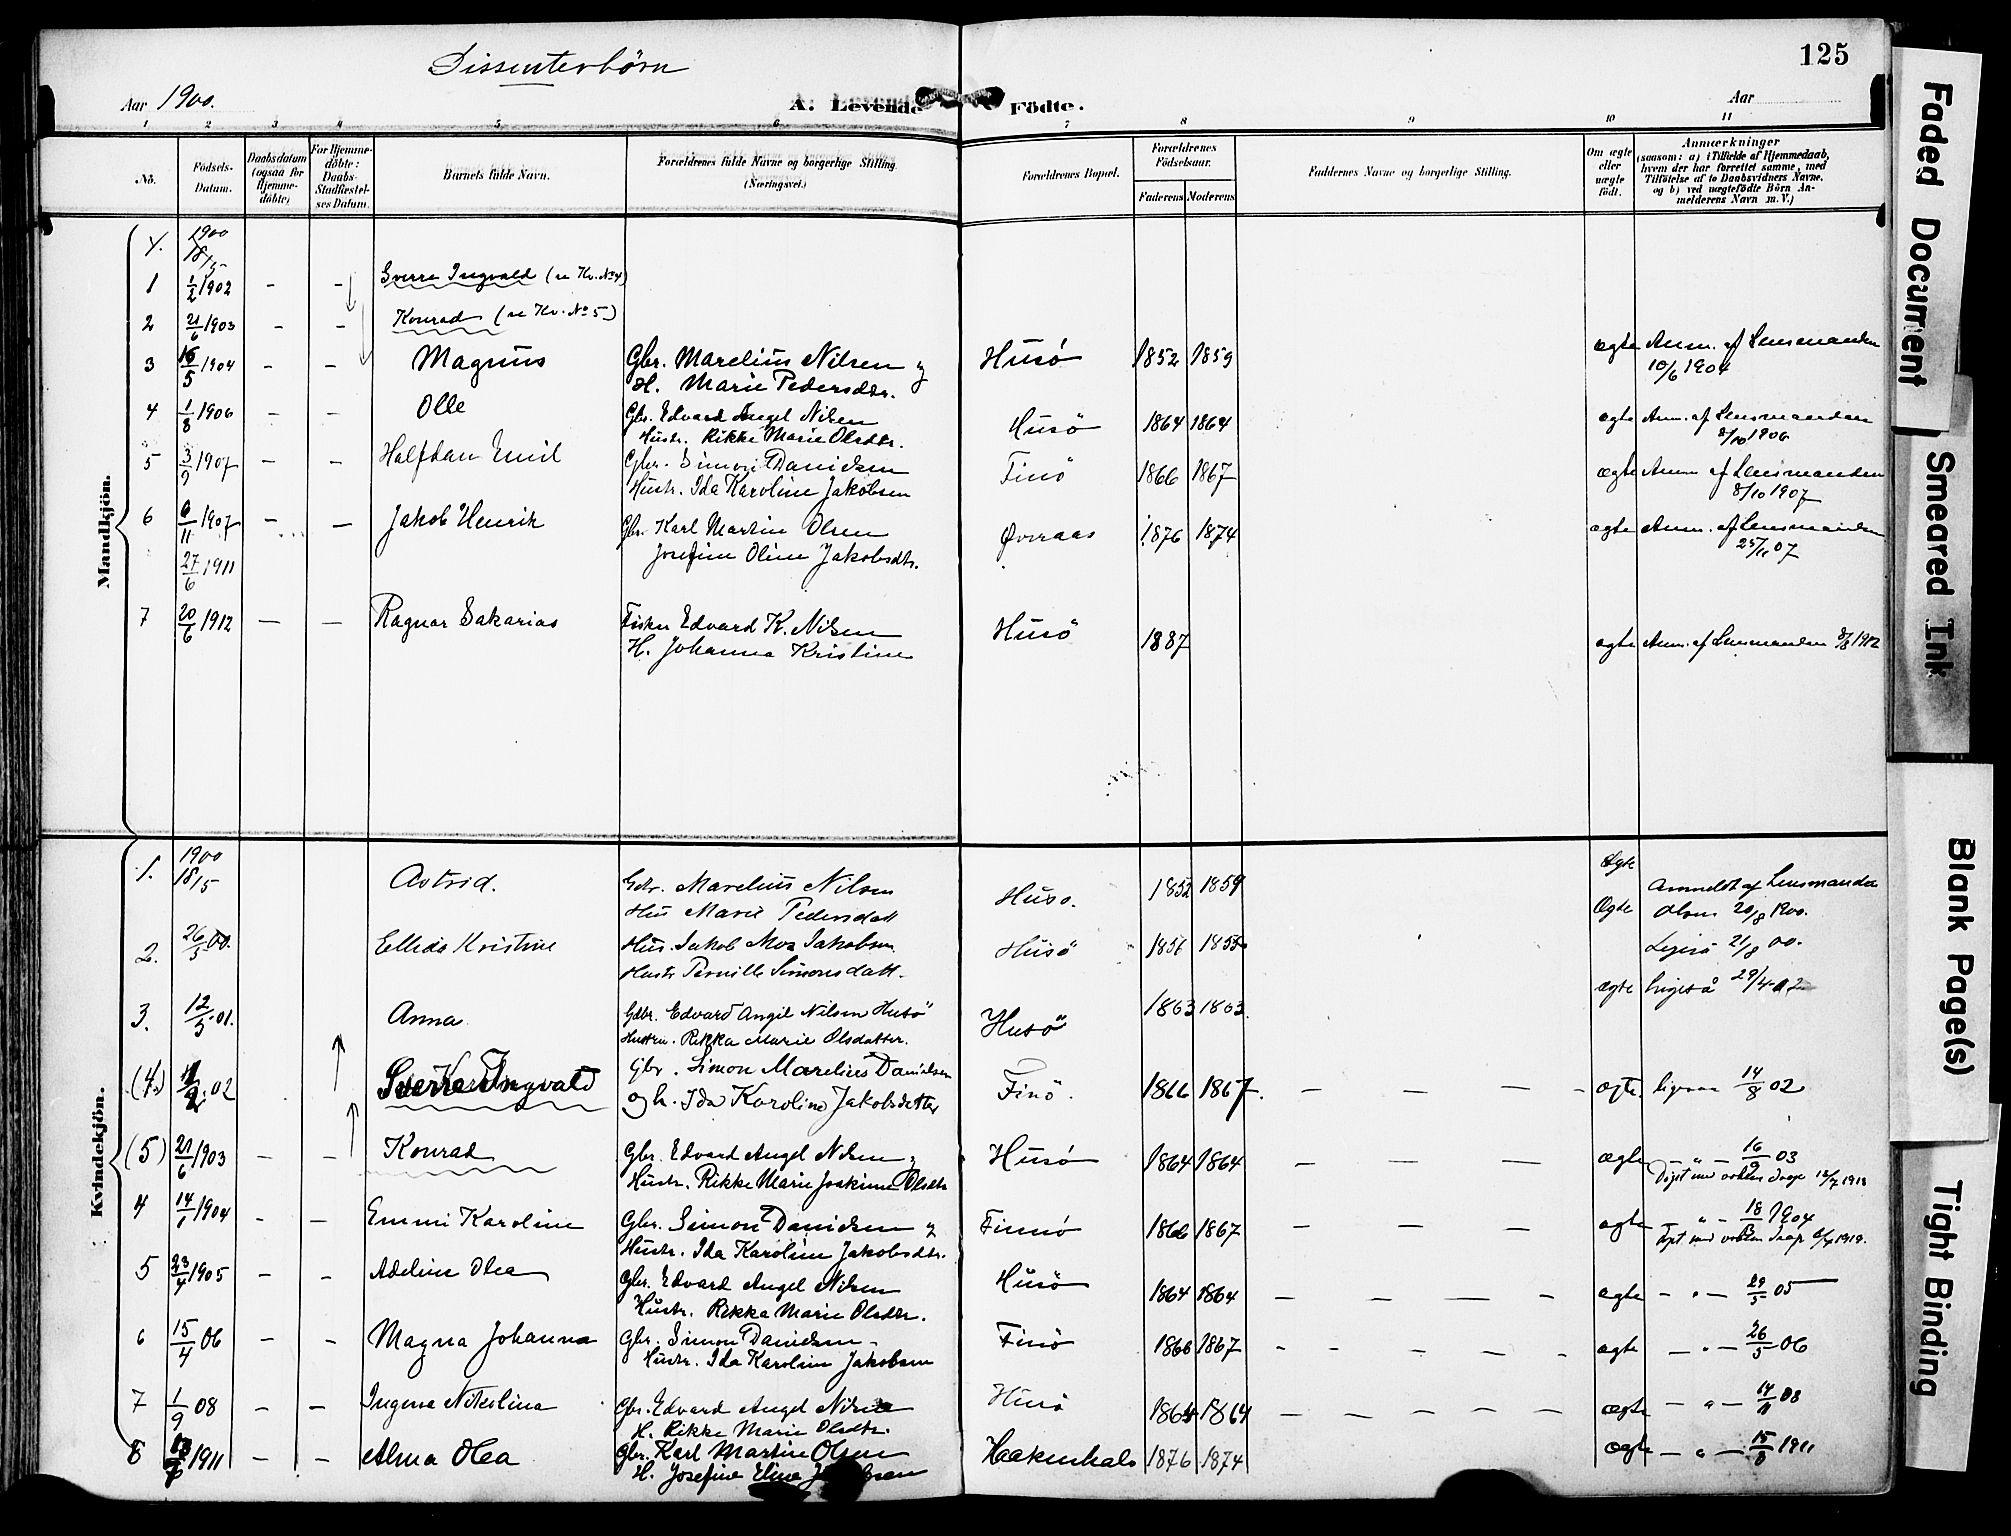 SAT, Ministerialprotokoller, klokkerbøker og fødselsregistre - Nordland, 859/L0848: Ministerialbok nr. 859A08, 1900-1912, s. 125